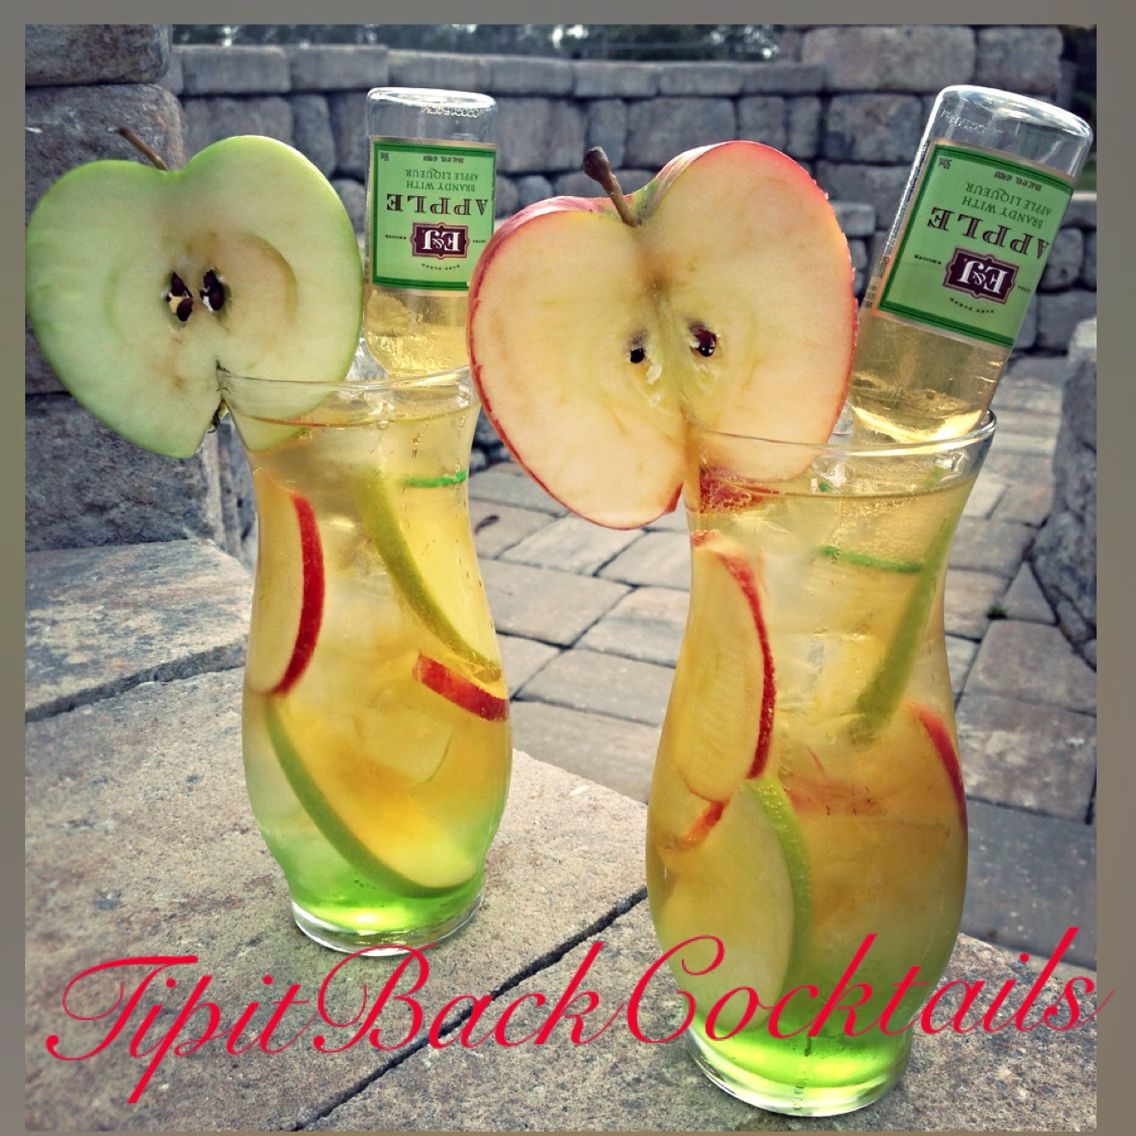 apple eandj. reward your hardworking self with some of these delicious cocktails carmel apple crisp. eandj n